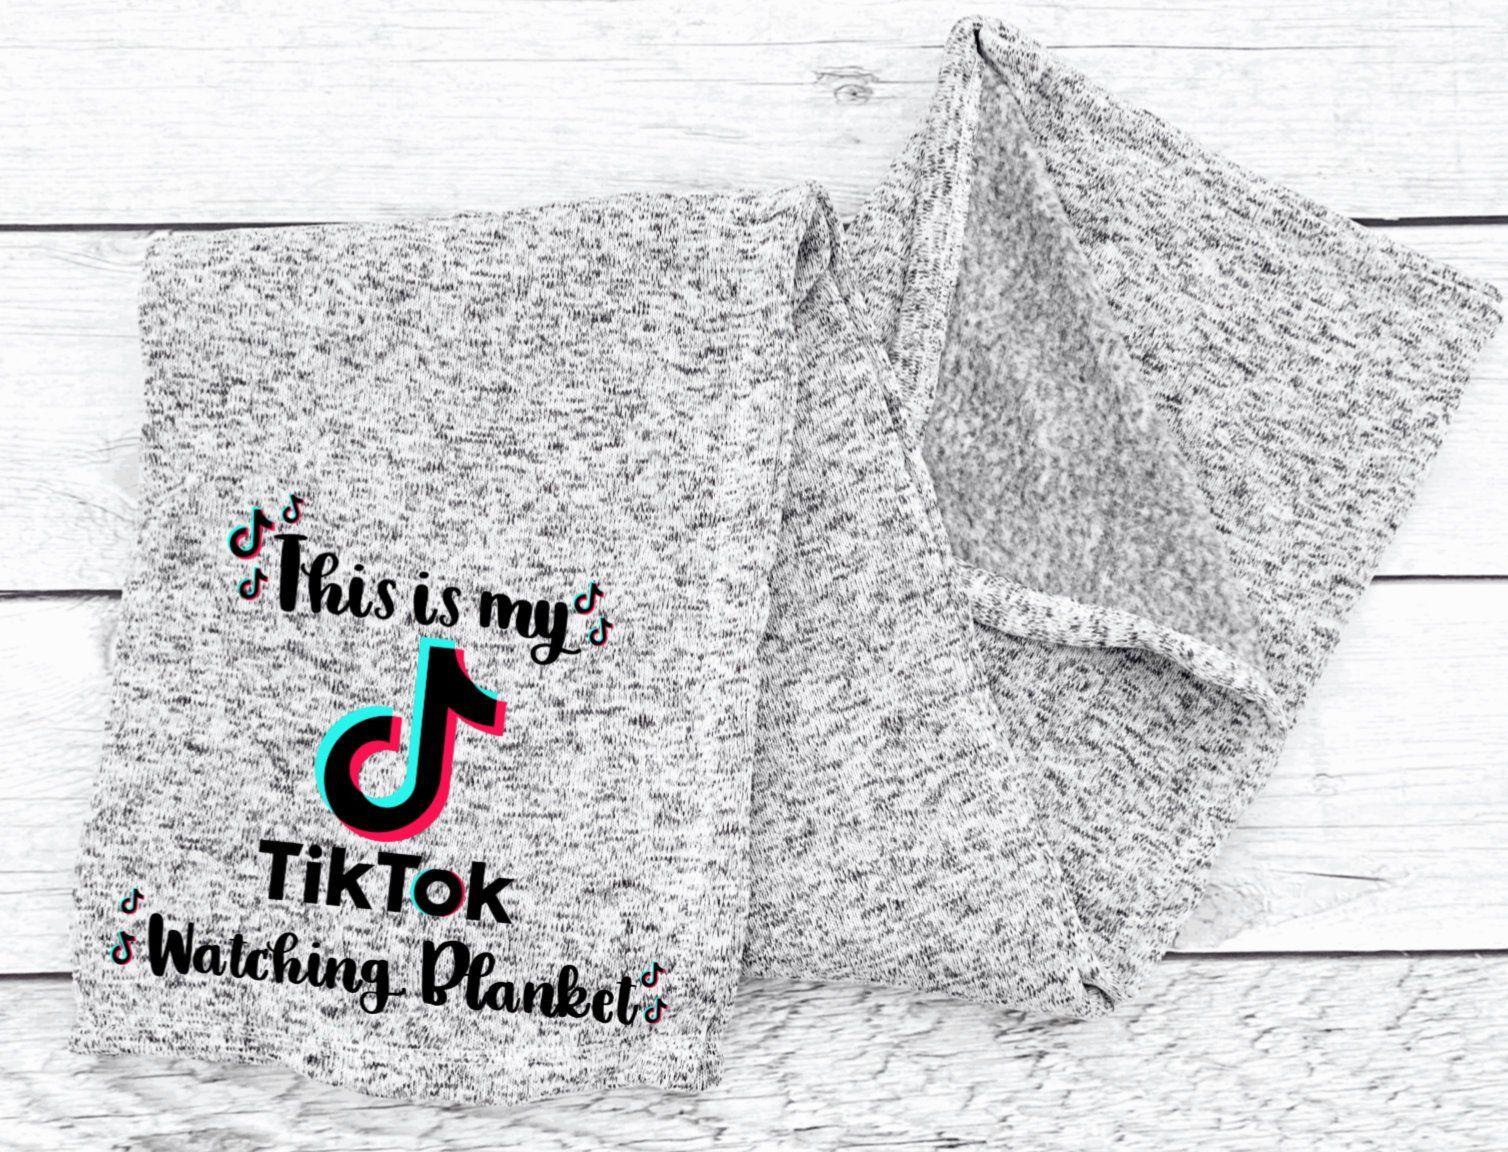 My Tik Tok Watching Blanket Tiktok Blanket In 2021 Knitted Blankets Christmas Craft Show Couch Blanket